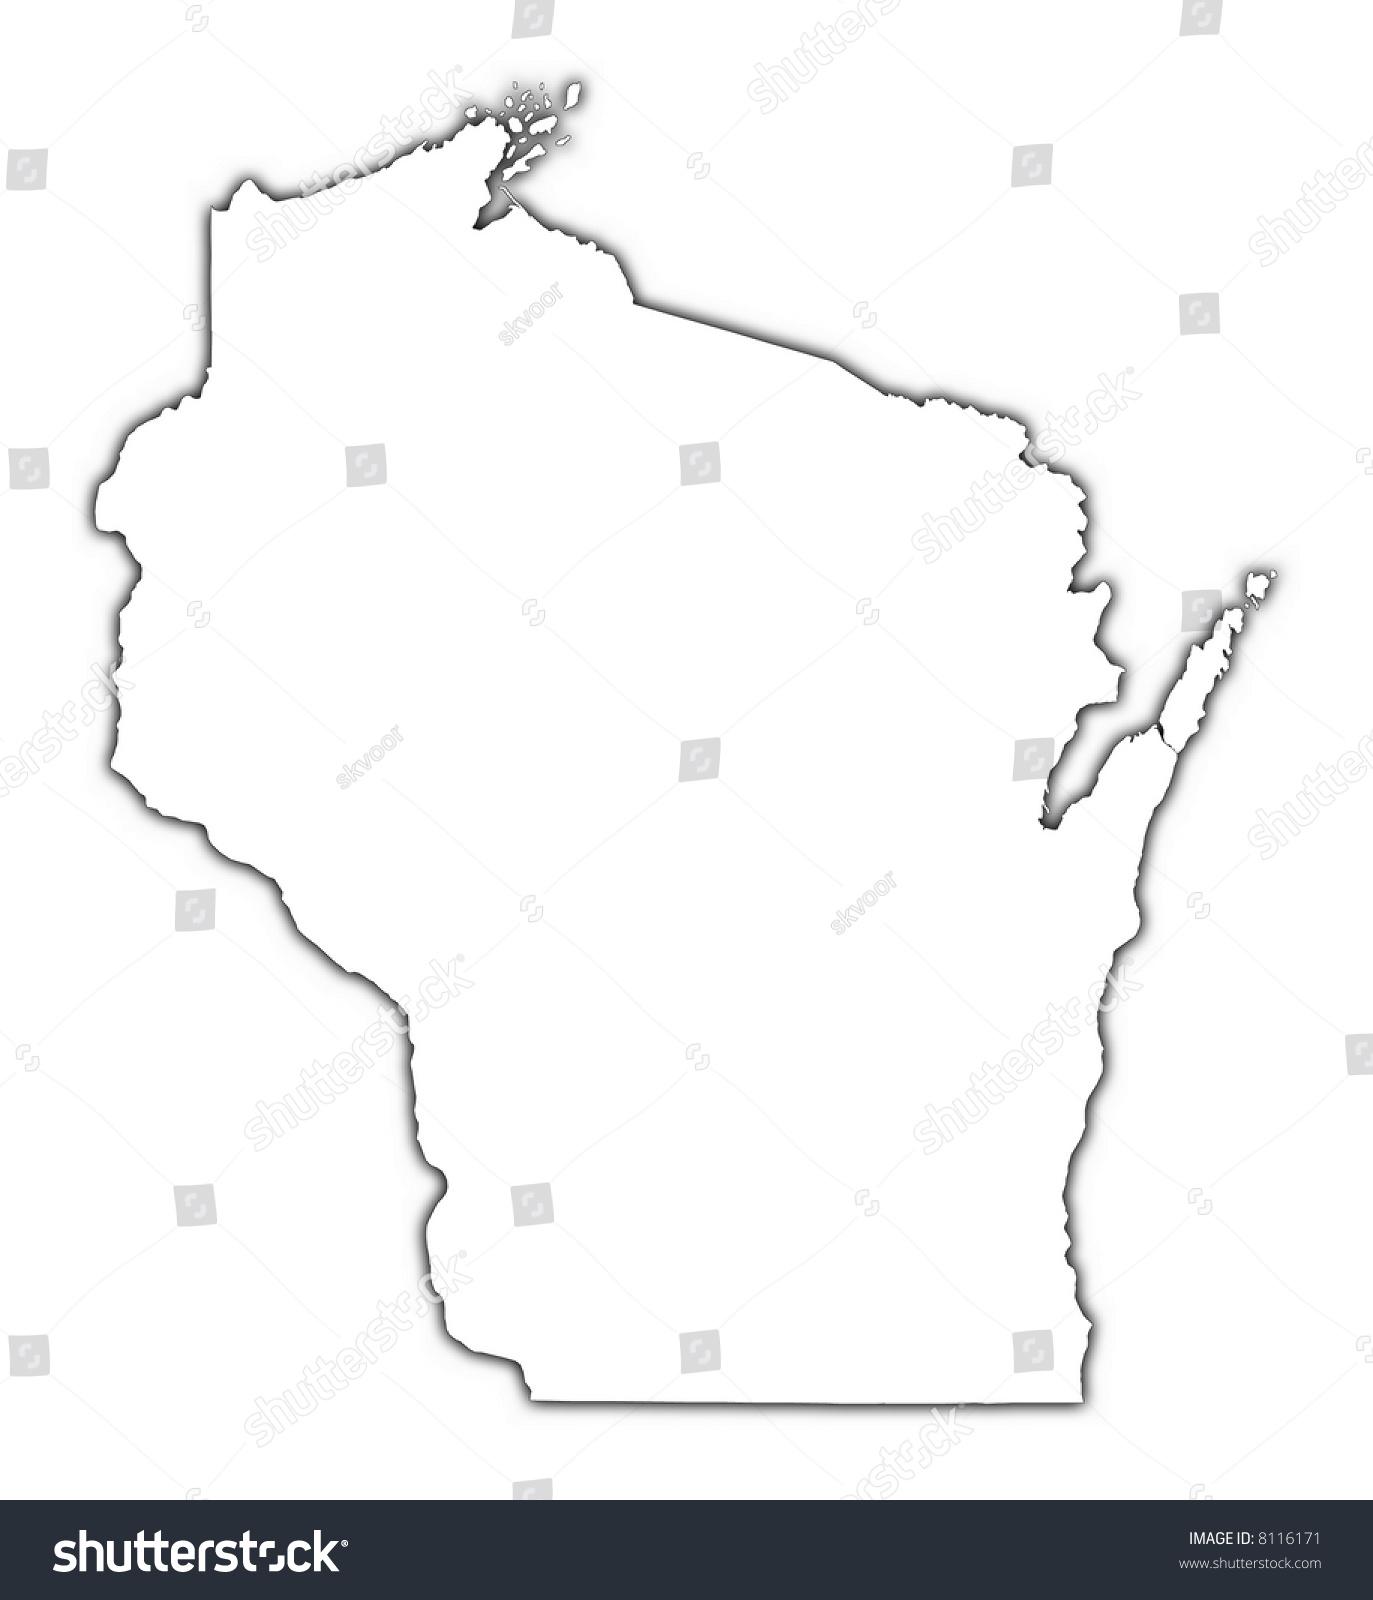 United States Of America USA Free Map Free Blank Map Free Blank - Blank map usa east coast